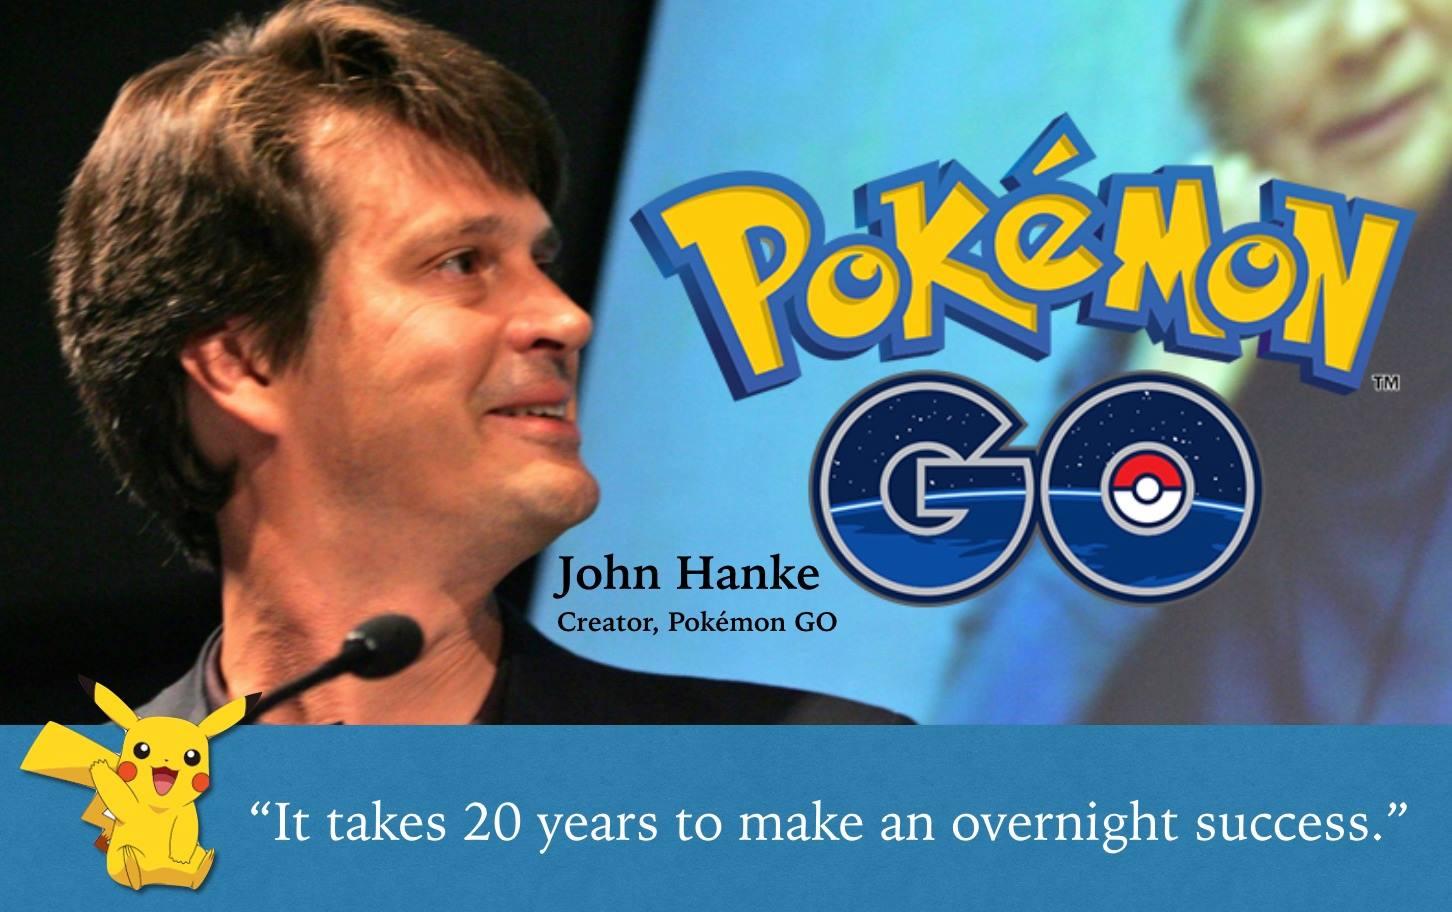 John Hanke quote